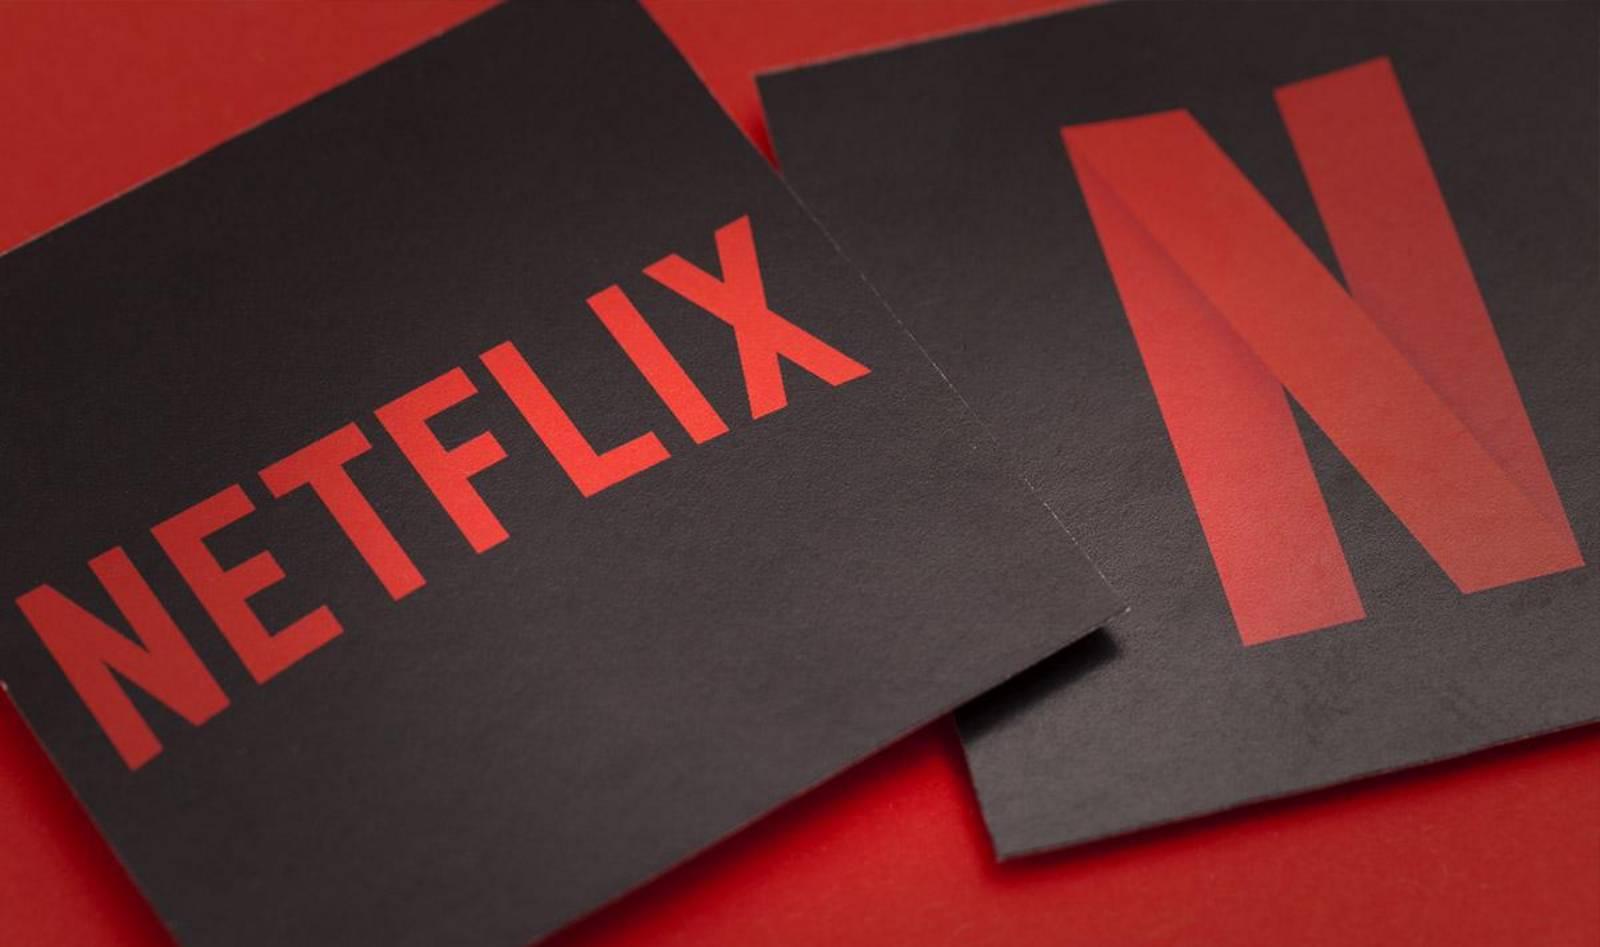 Netflix space